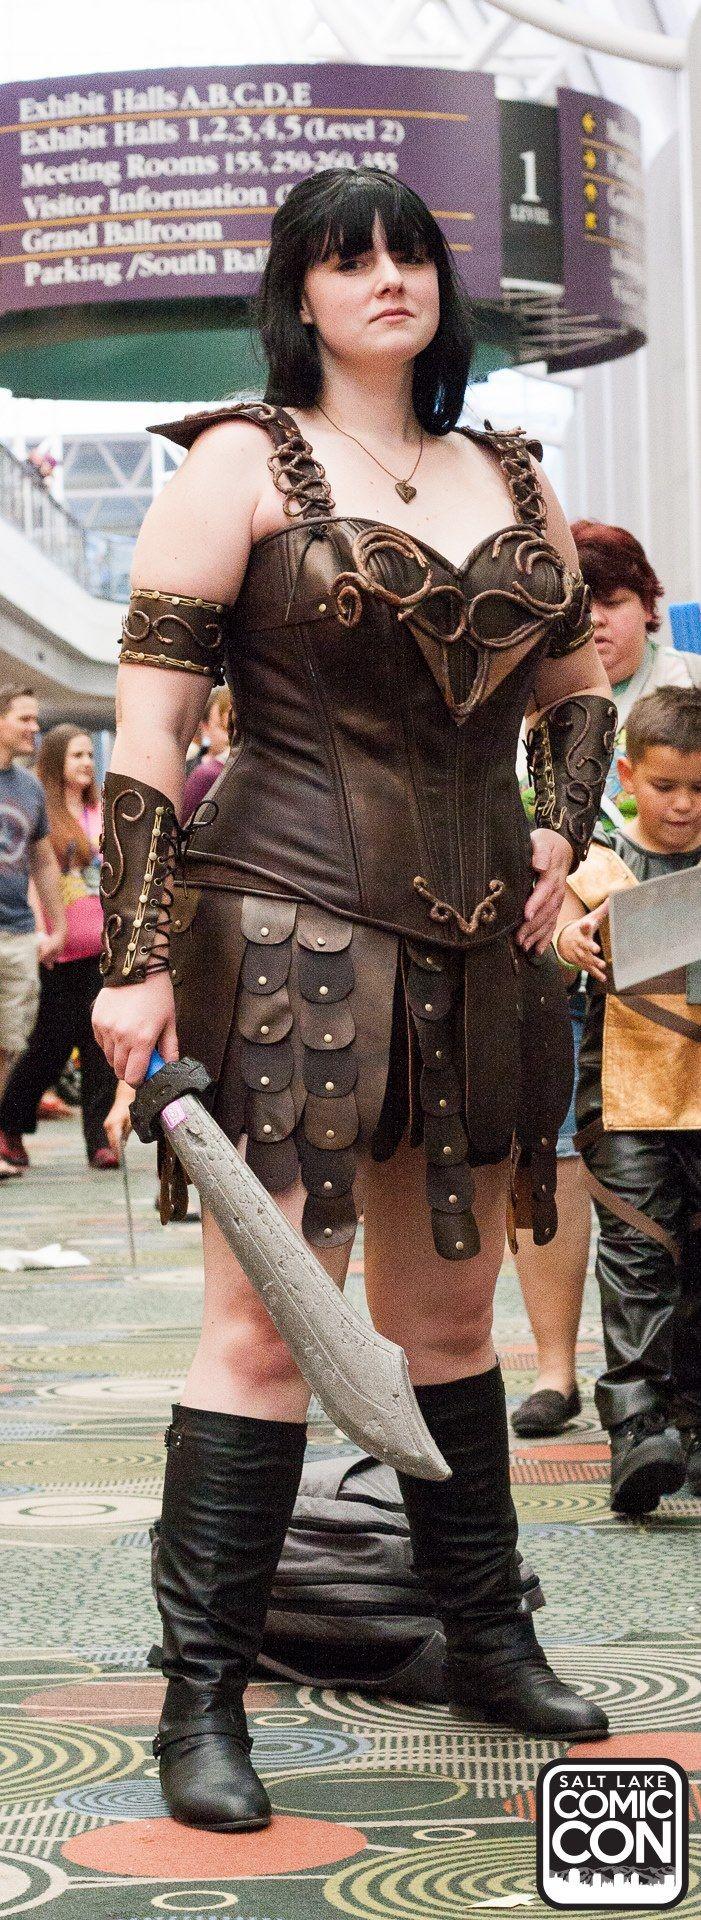 Xena Warrior Princess cosplayer at Salt Lake Comic Con ...